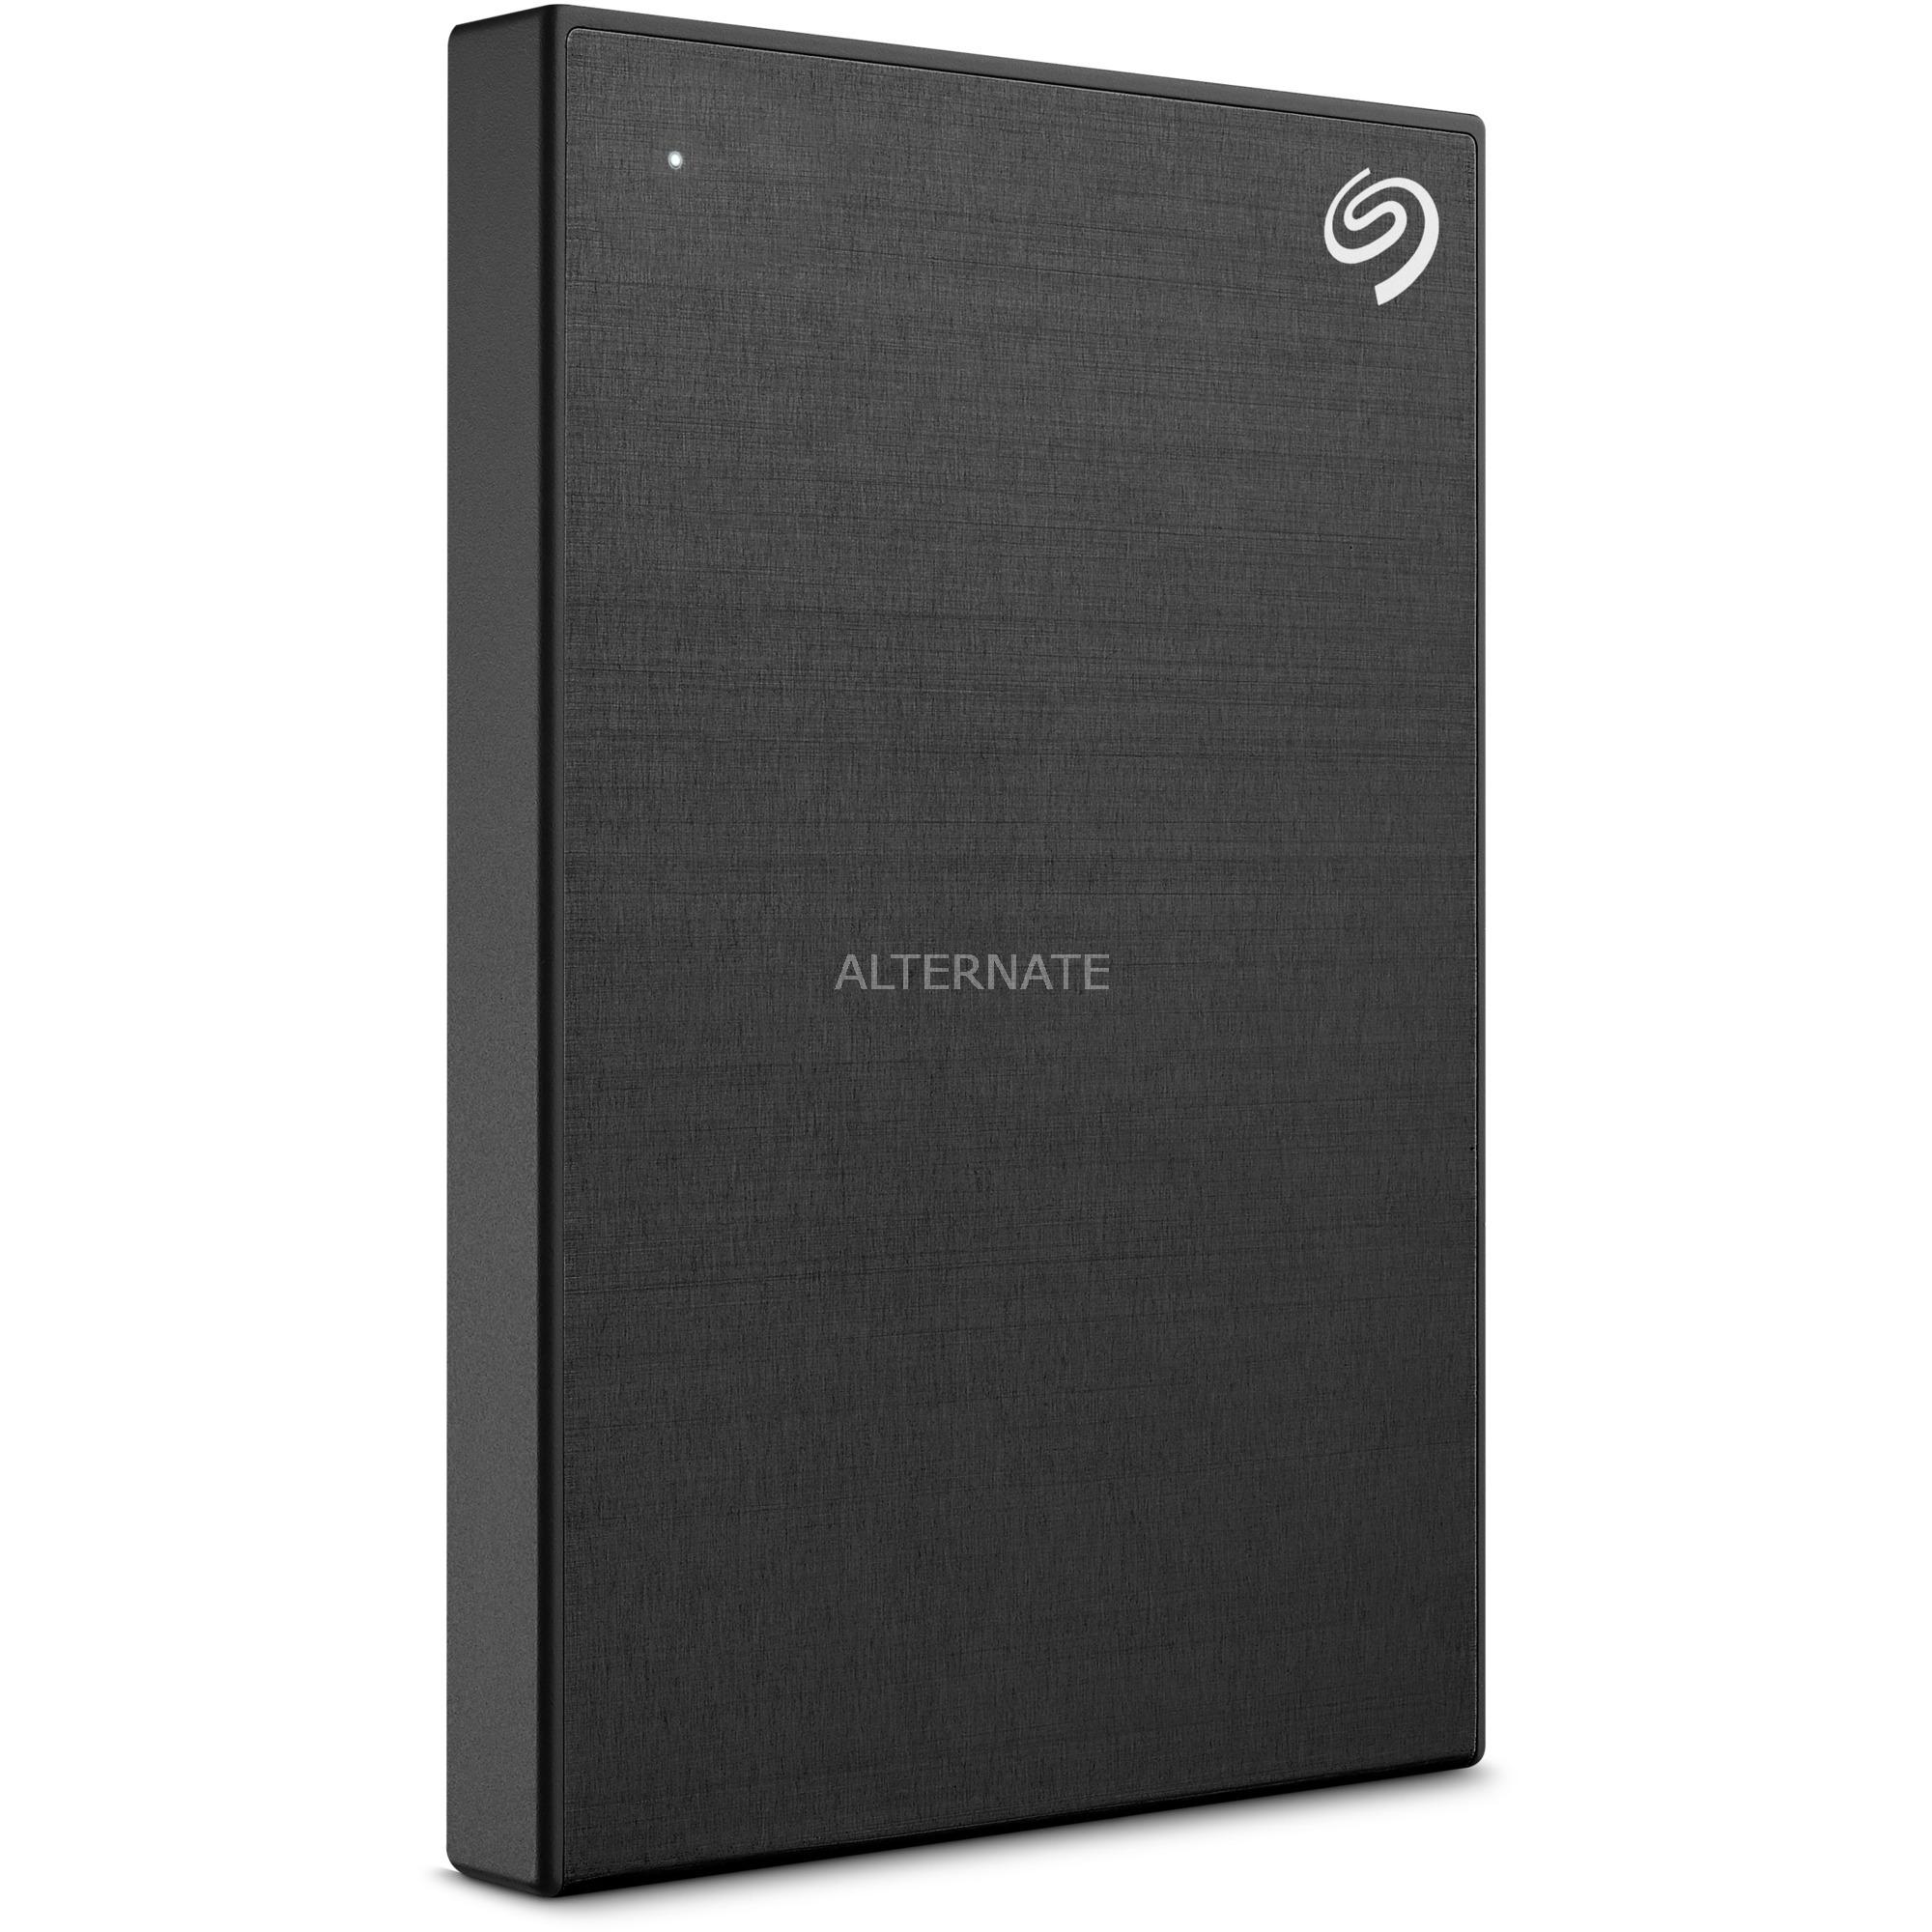 Backup Plus STHN2000400 disco duro externo 2000 GB Negro, Unidad de disco duro